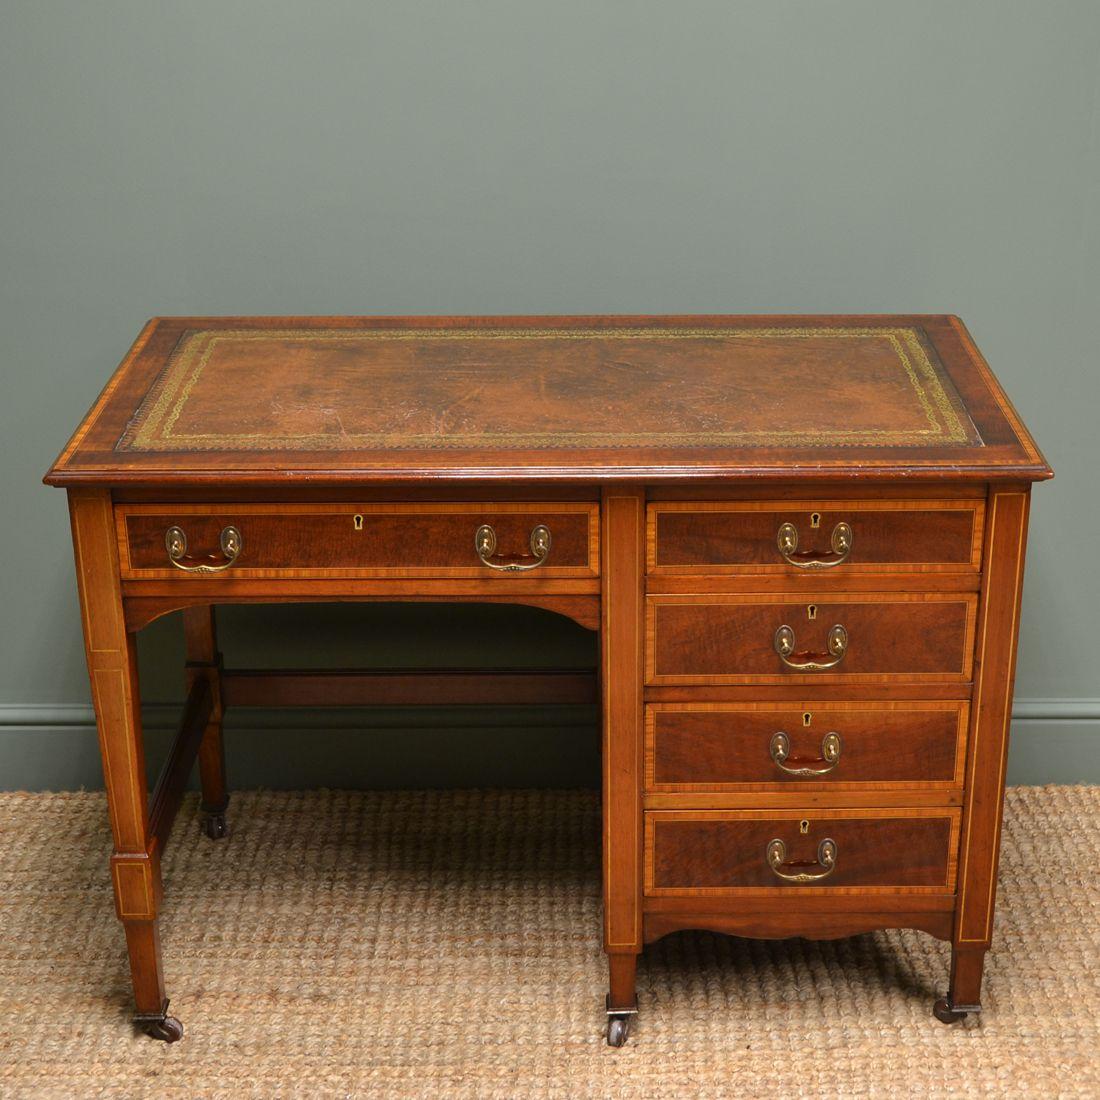 Inlaid Edwardian Mahogany Antique Desk By Jas Shoolbred Antique Desk Desk Fine Antique Furniture